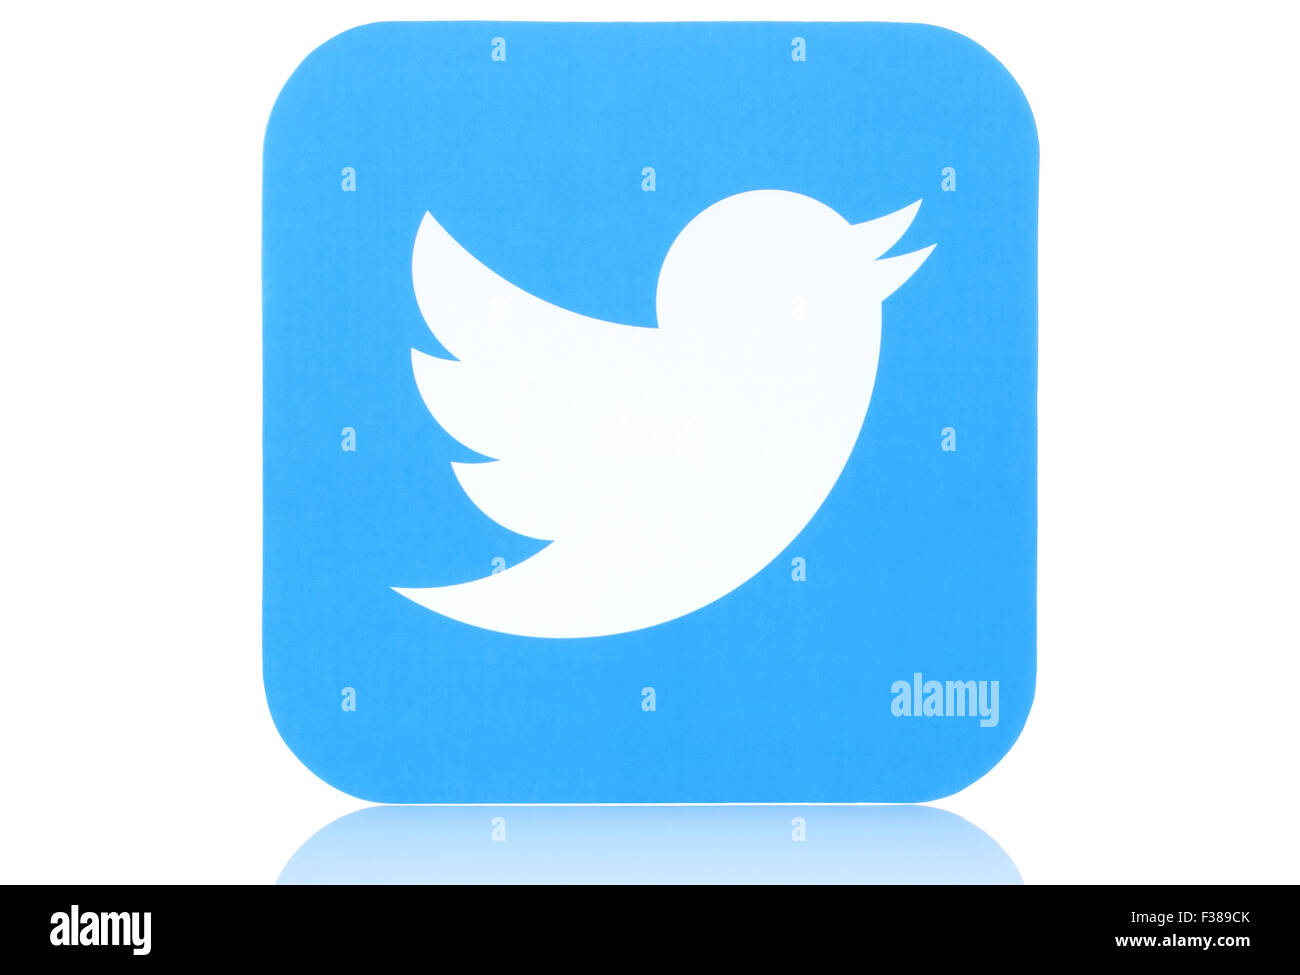 KIEV, UKRAINE - MAY 07, 2015:Twitter logotype printed on paper. - Stock Image